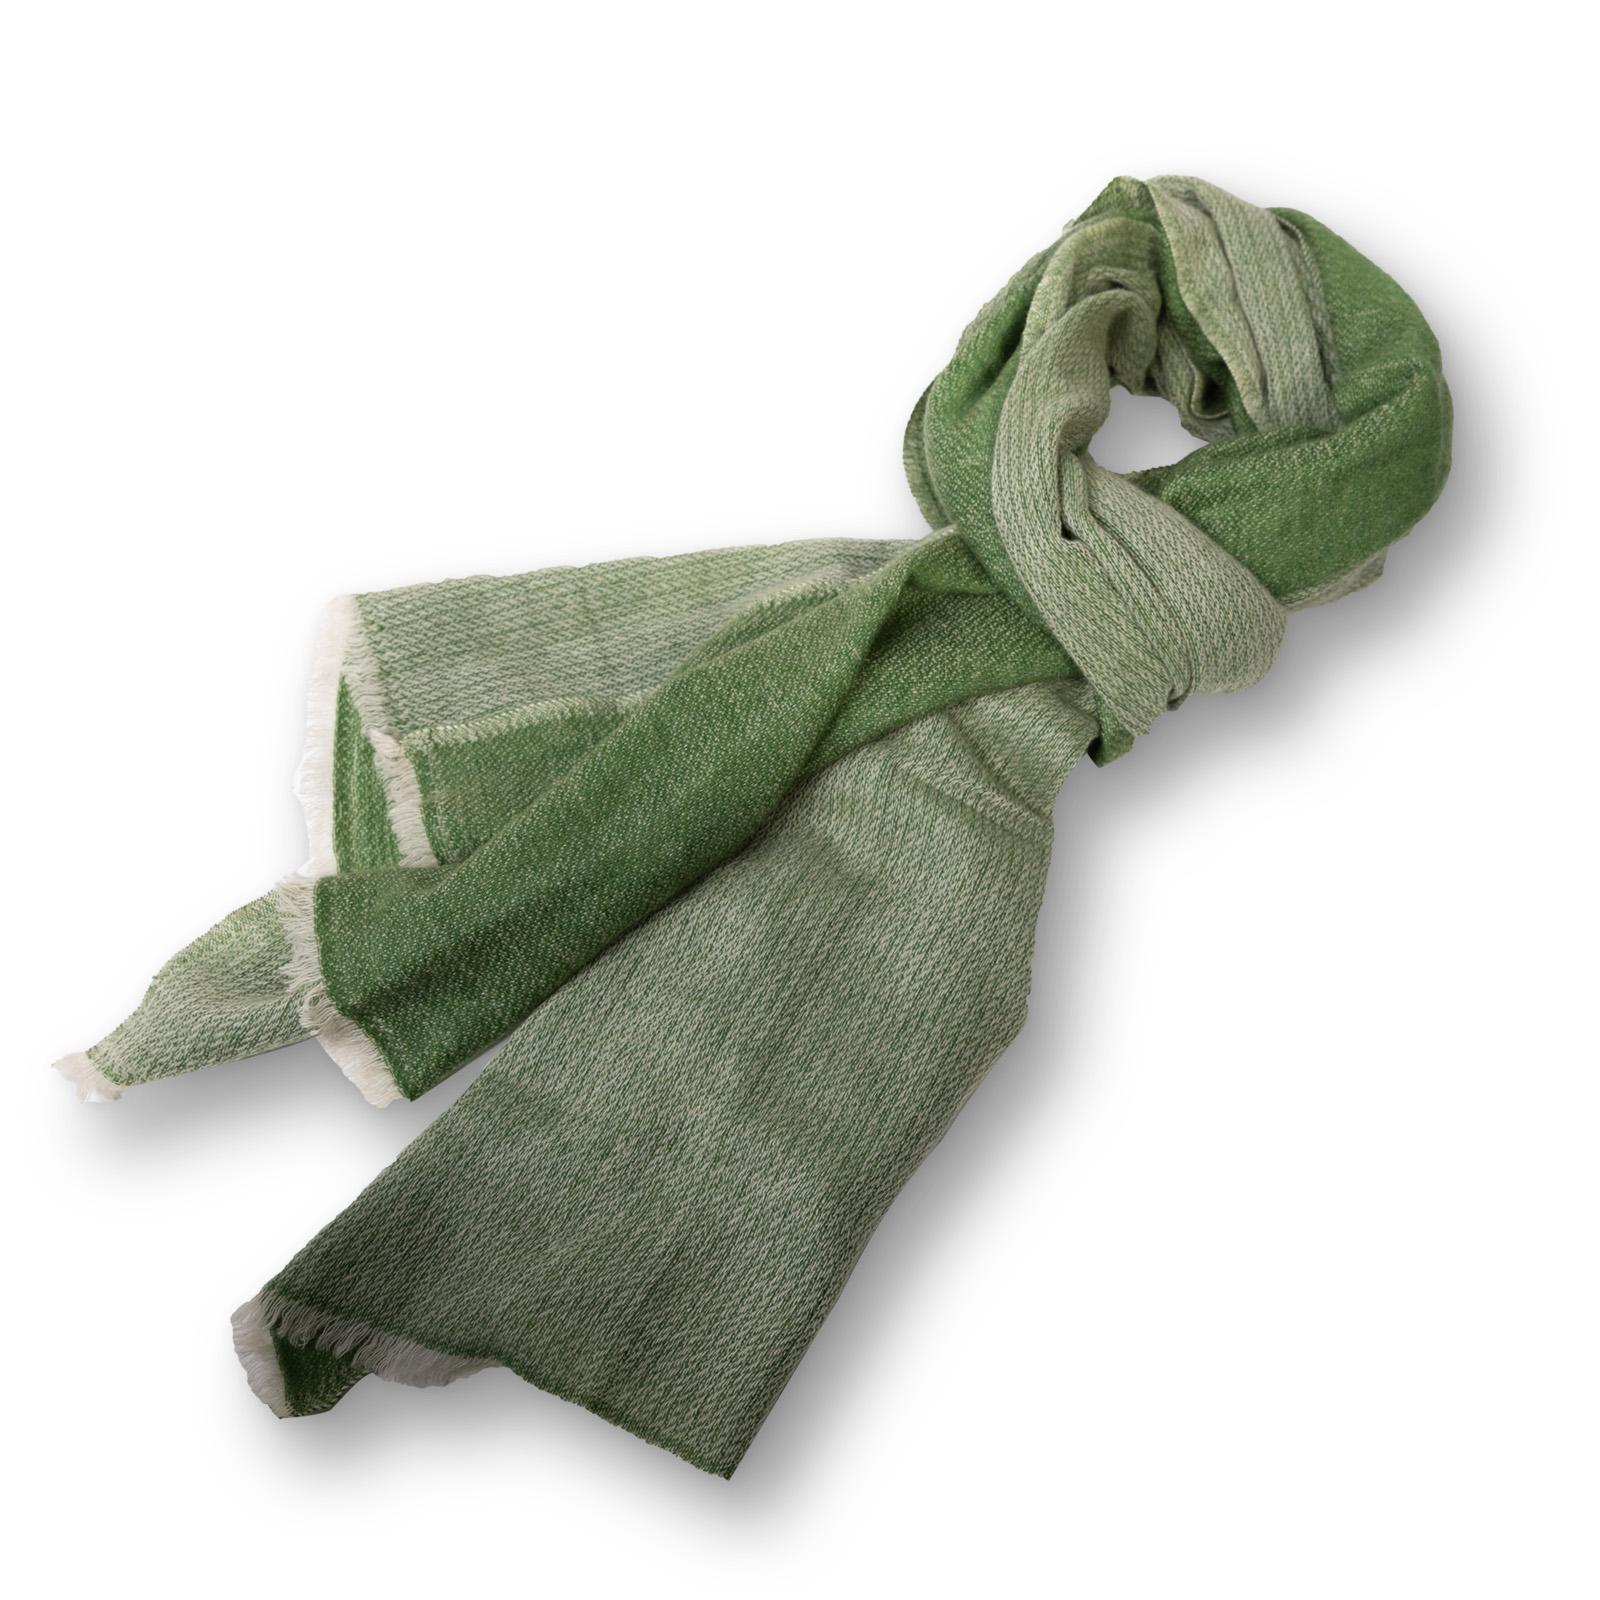 Pashmina - 100% Cashmere  zweifarbig  aus Nepal  70x200 cm grün/grün-natur